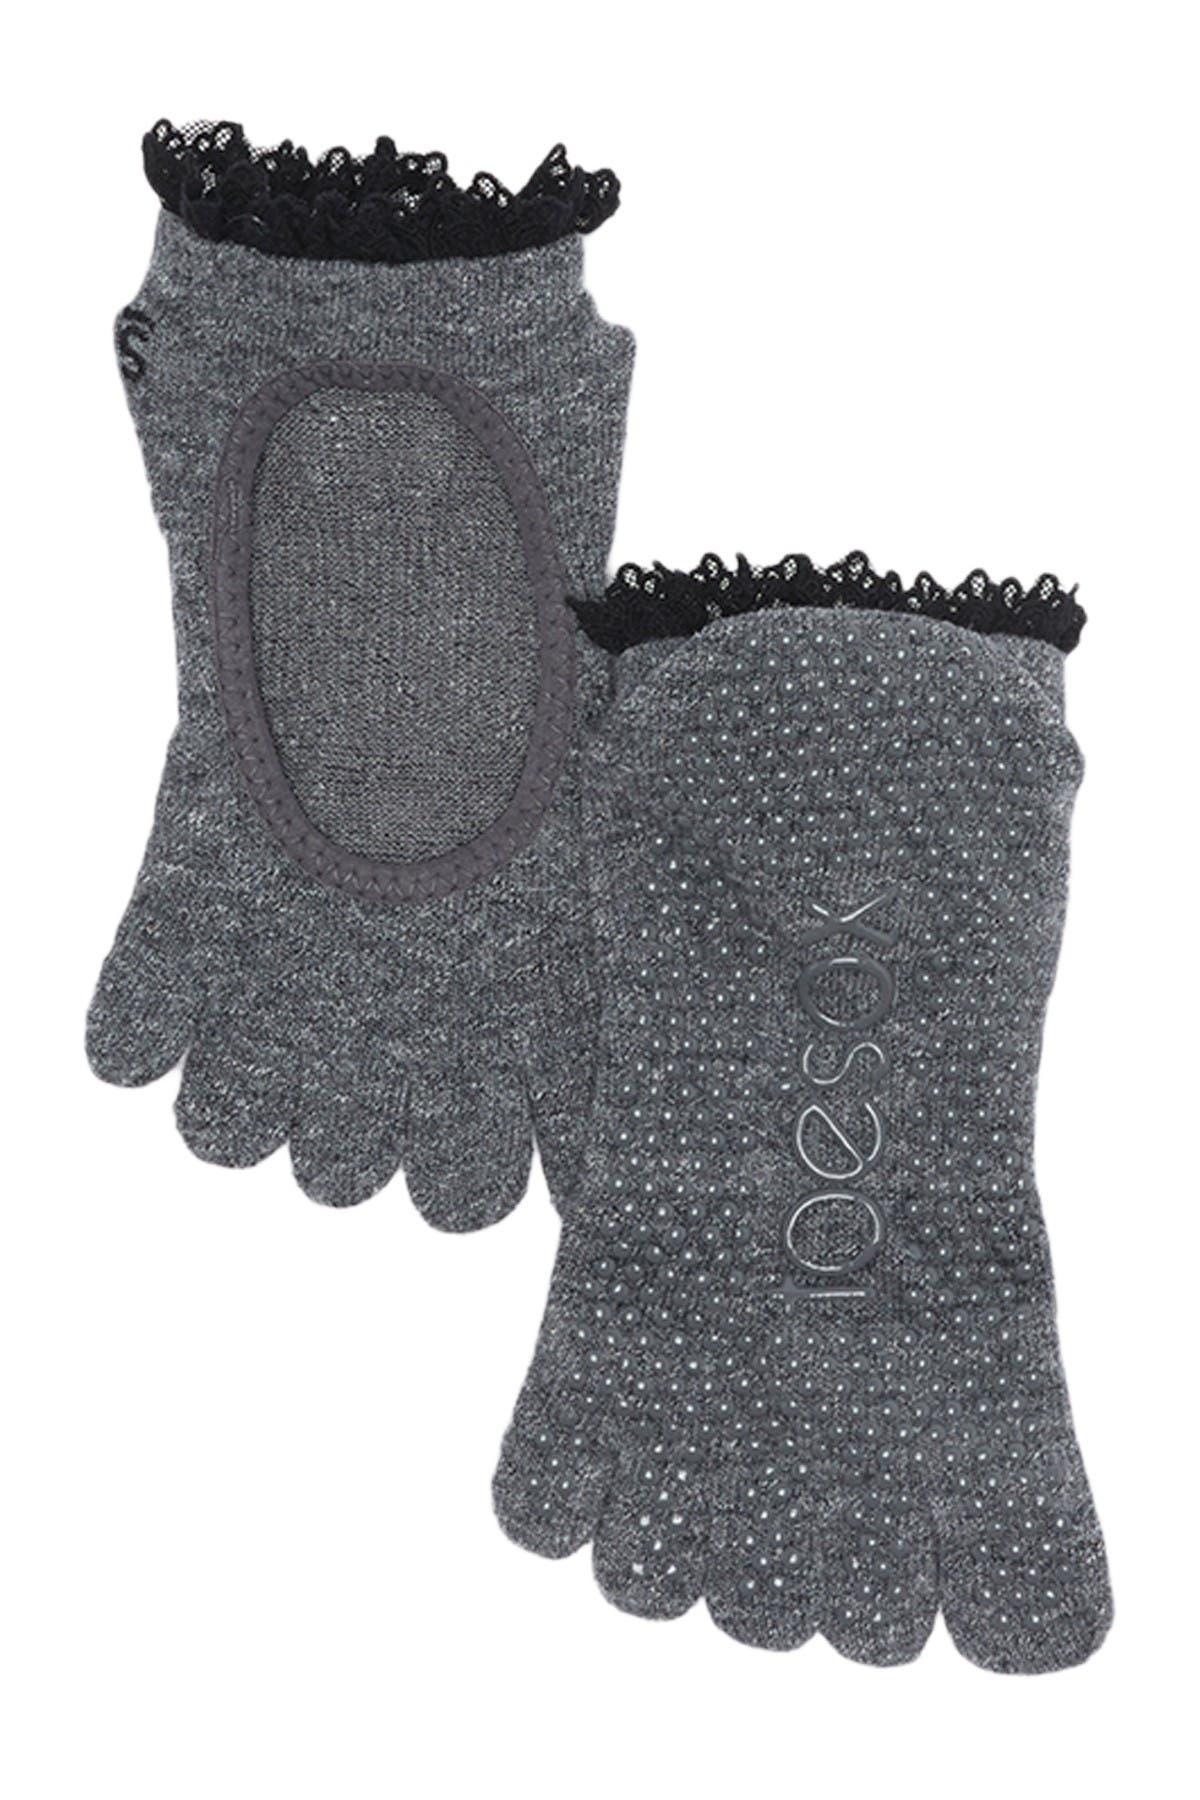 Image of ToeSox Full Toe Bella Grip Socks